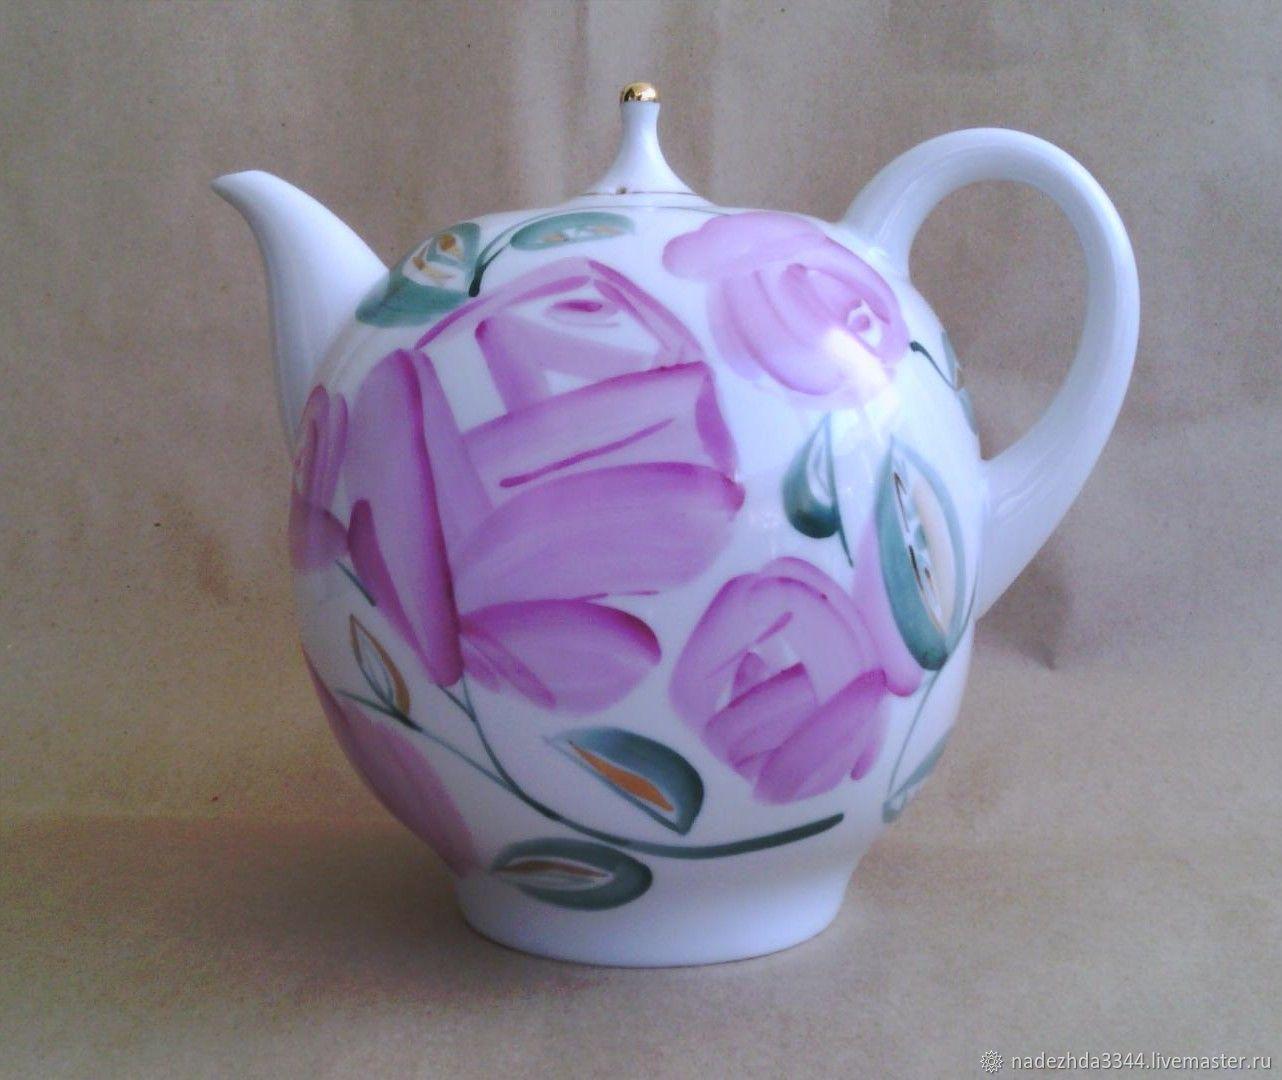 Large teapot factory, 2 litres, Vintage teapots, Moscow,  Фото №1